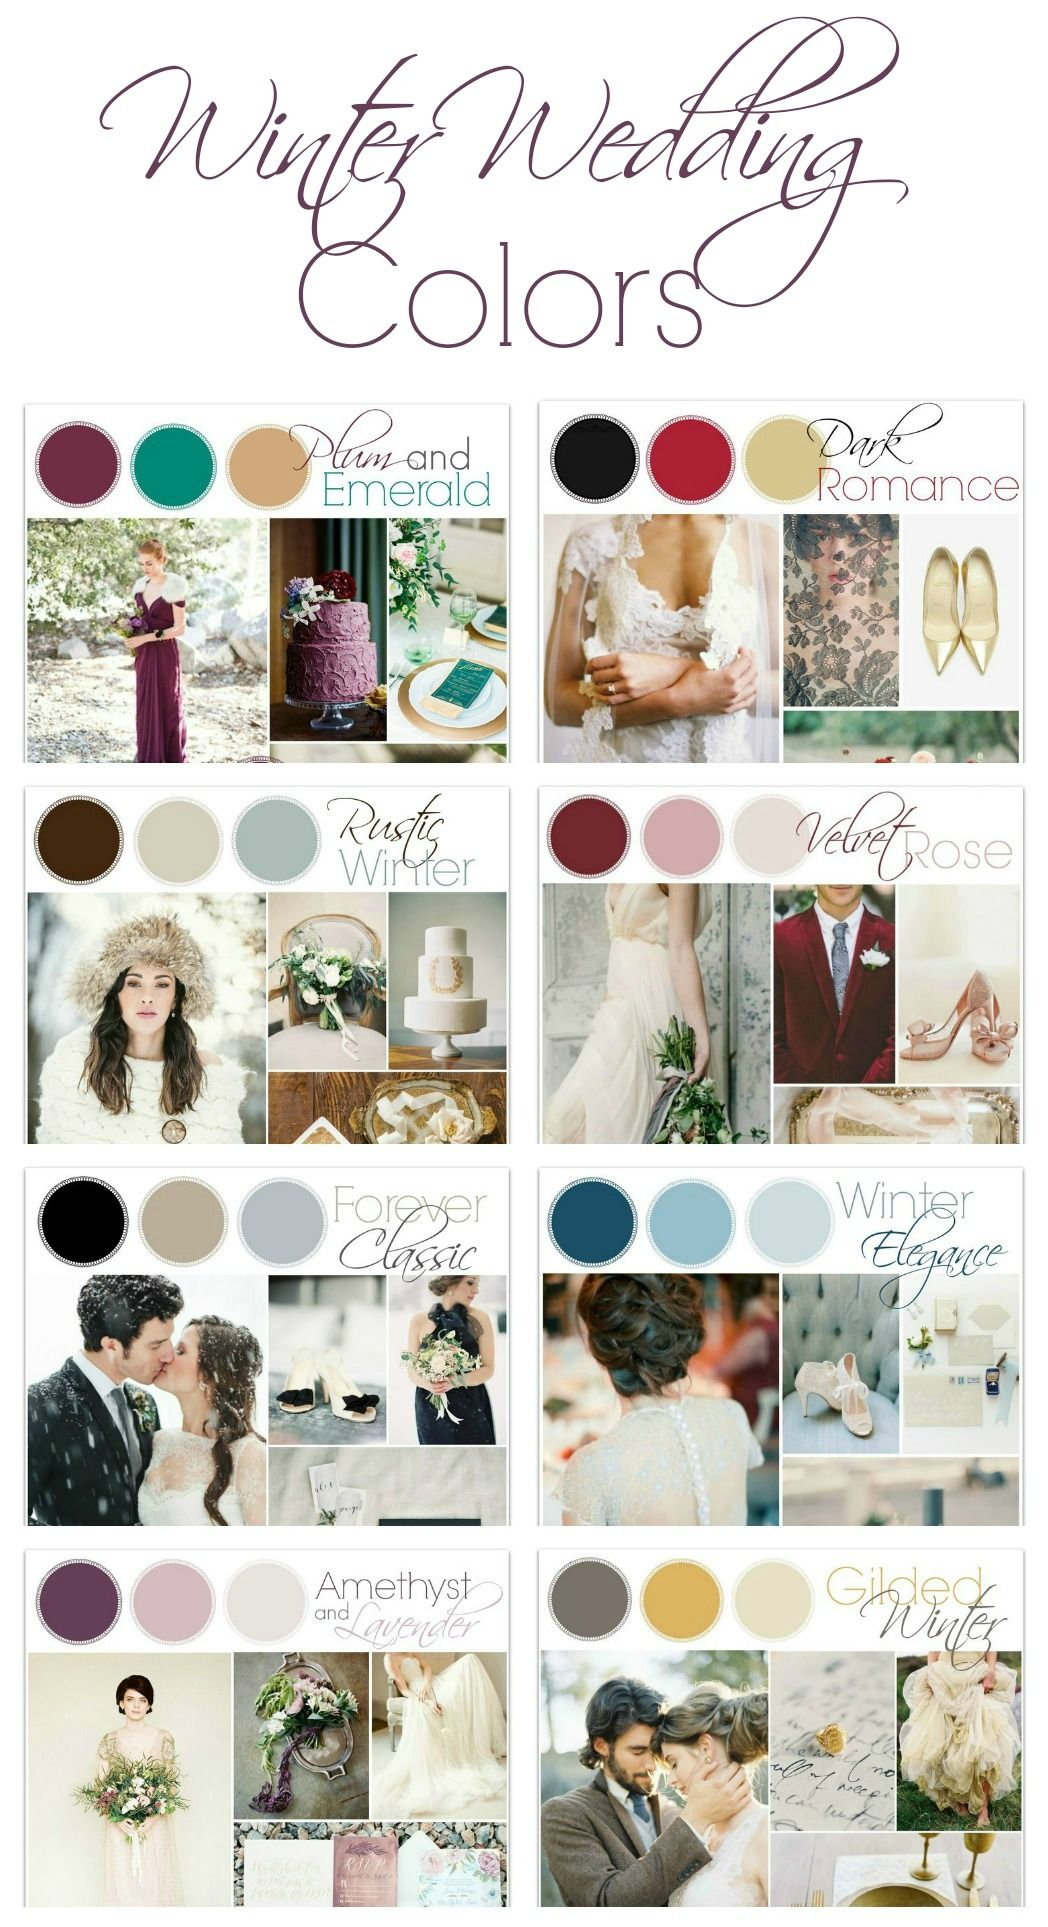 February Wedding Color Ideas   Invitationjdi.co